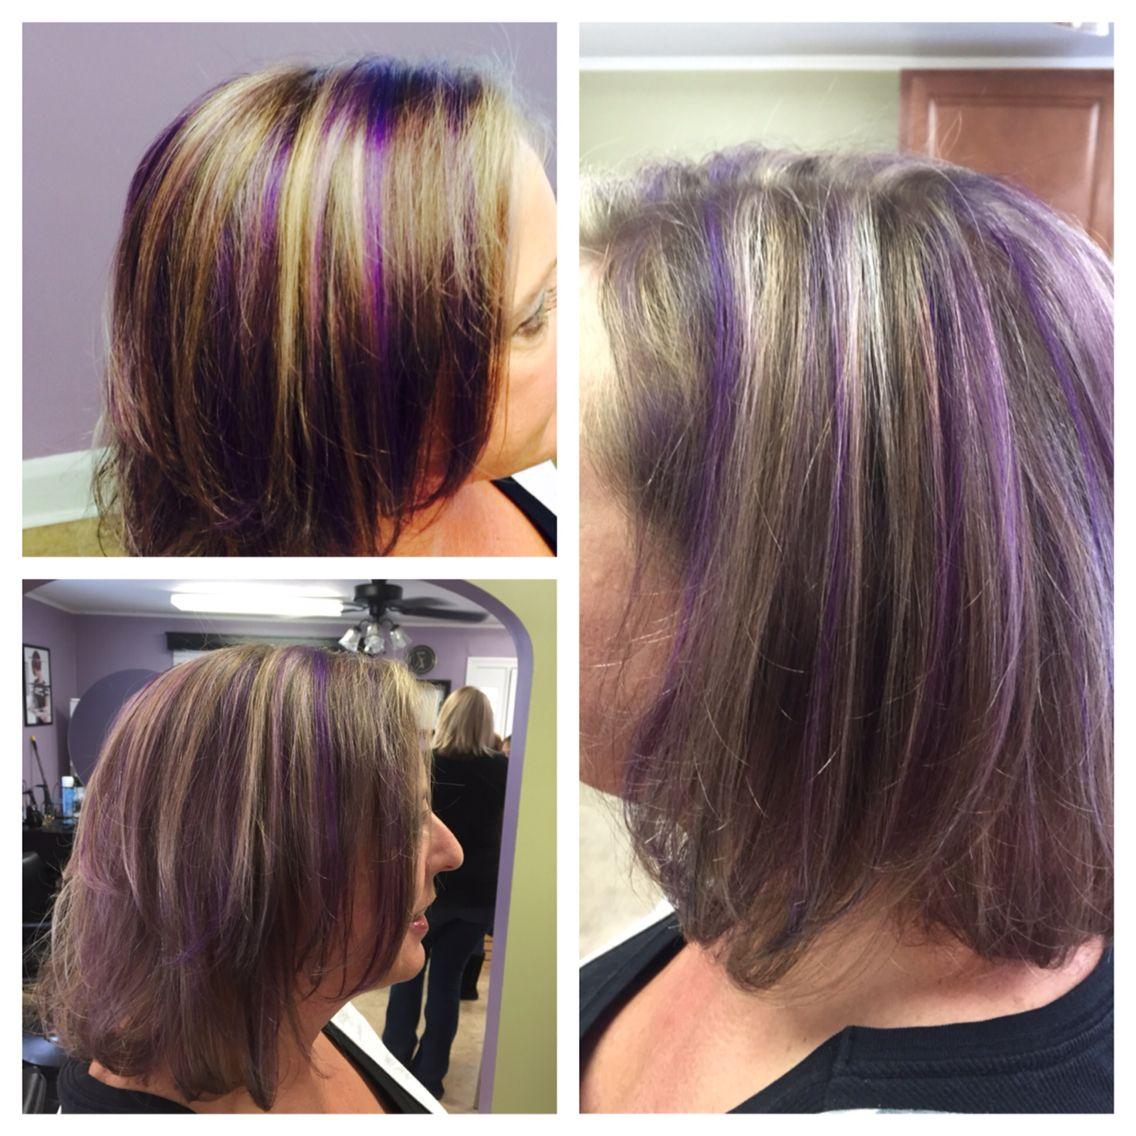 Bring on the purple hilites